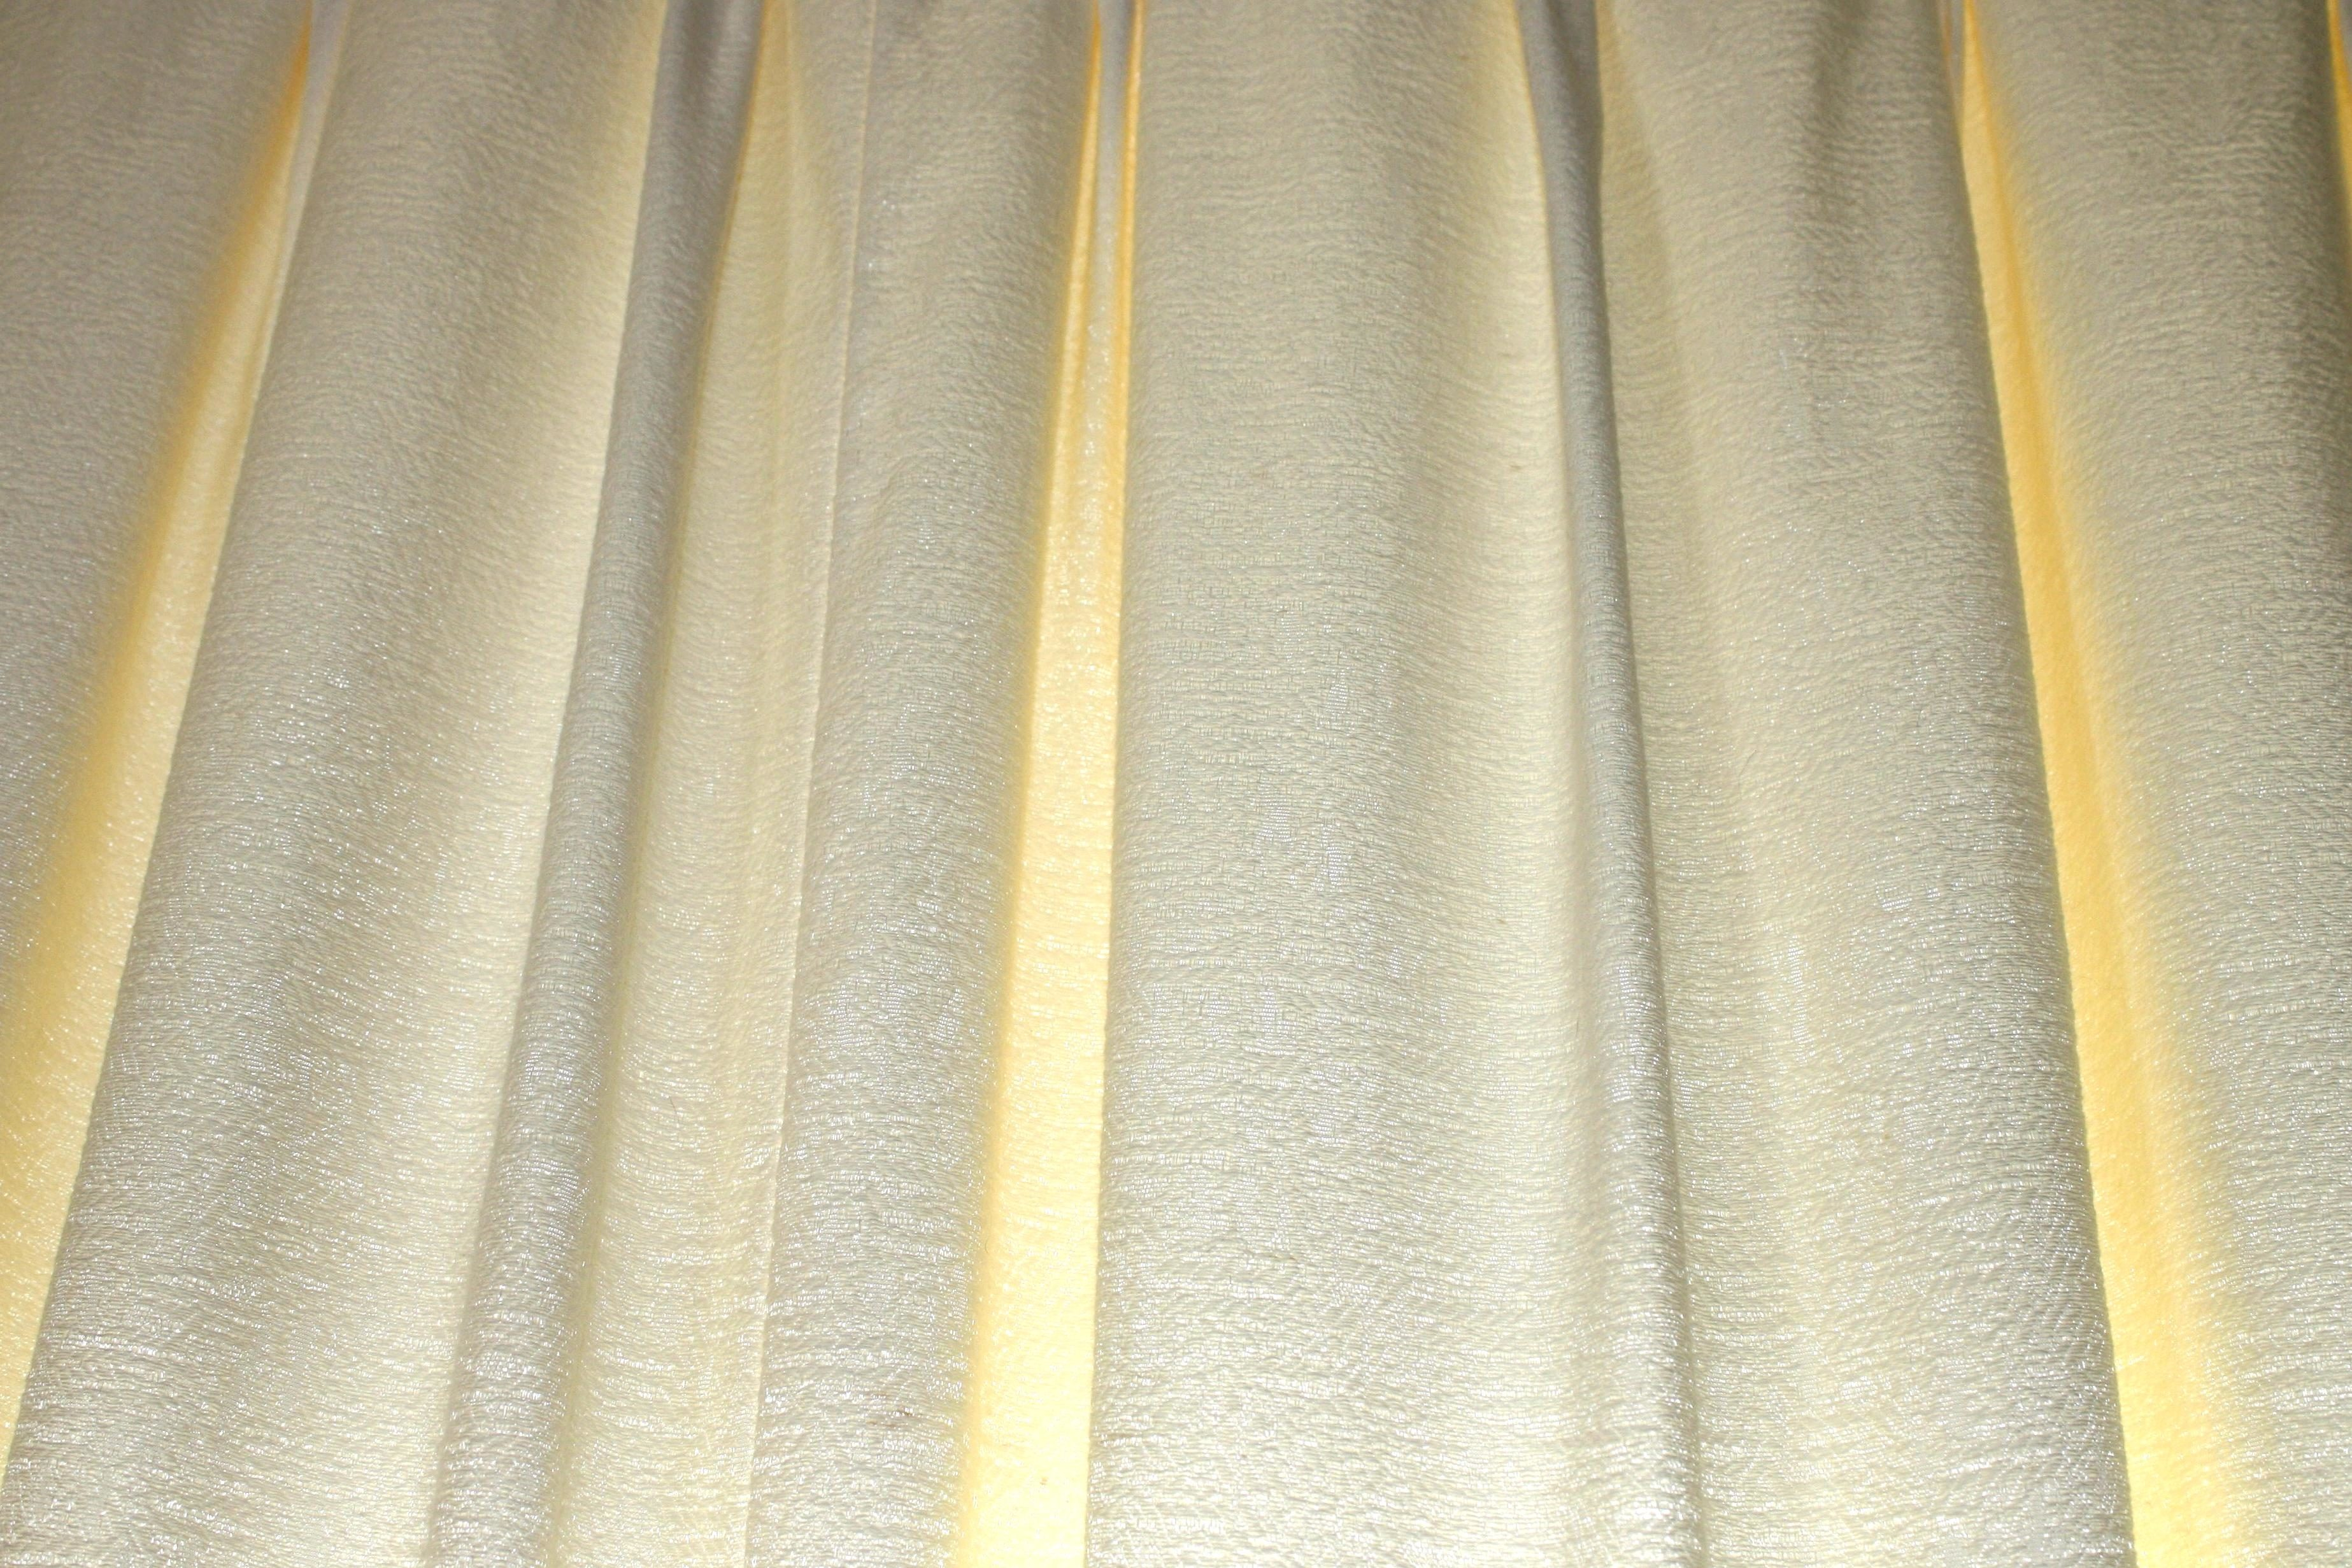 free picture  cream color  curtains  texture  textil